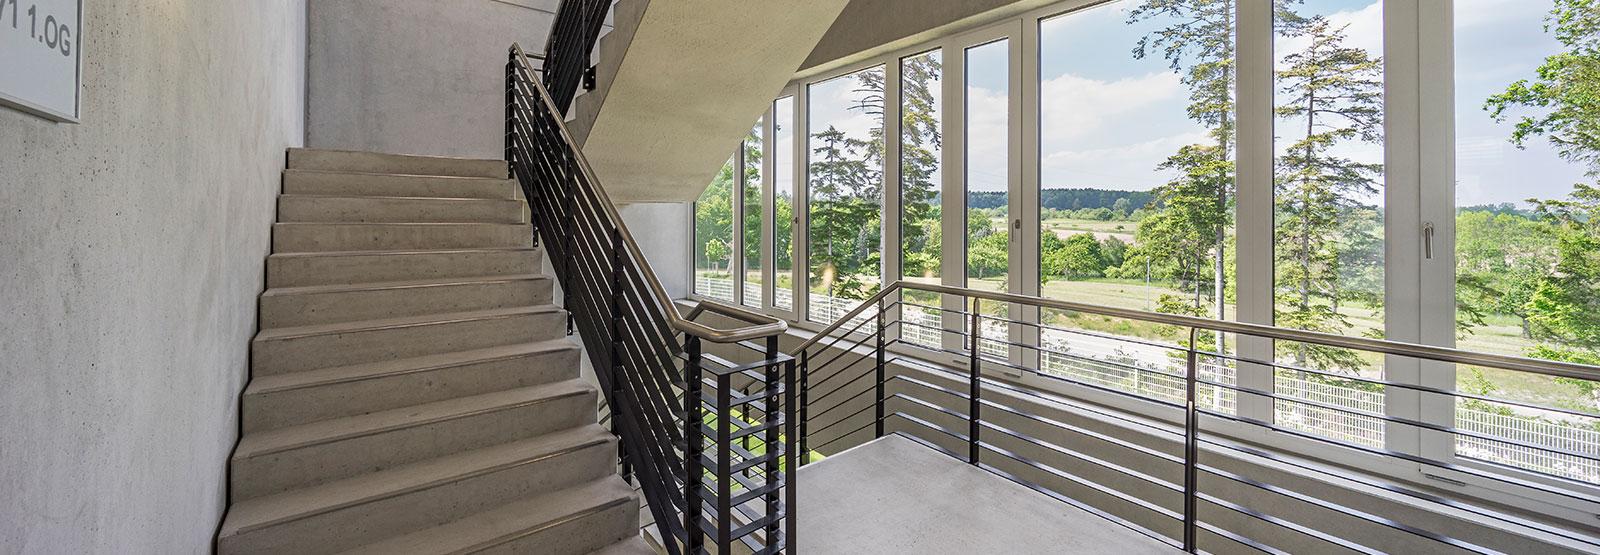 Treppenhaus mit Blick ins Grüne